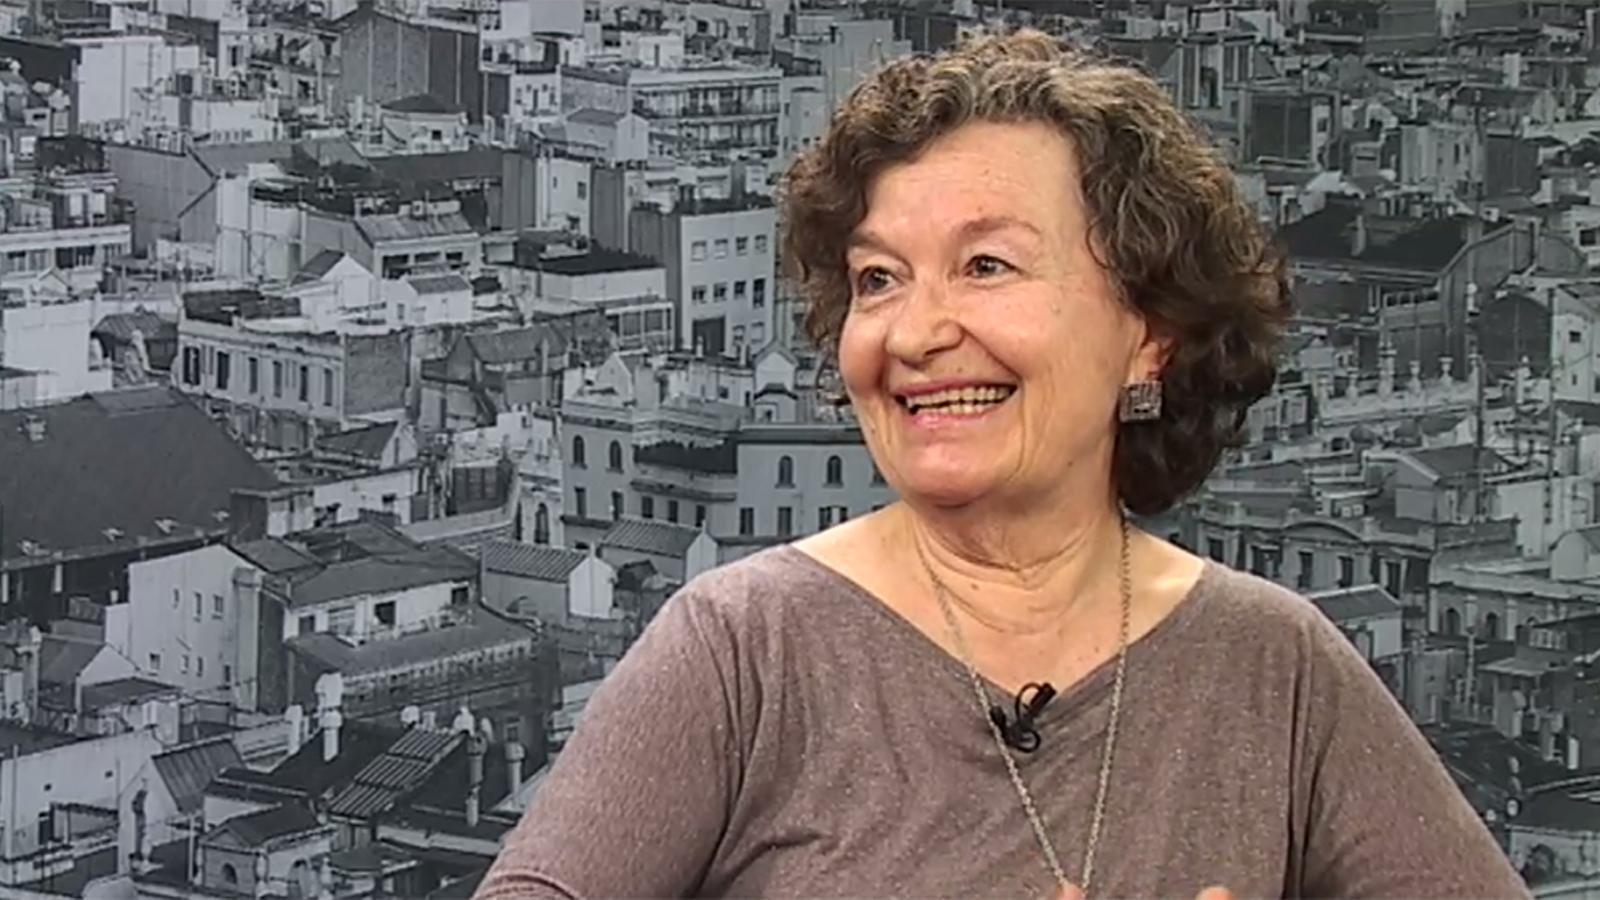 Entrevista d'Antoni Bassas a Maria Barbal